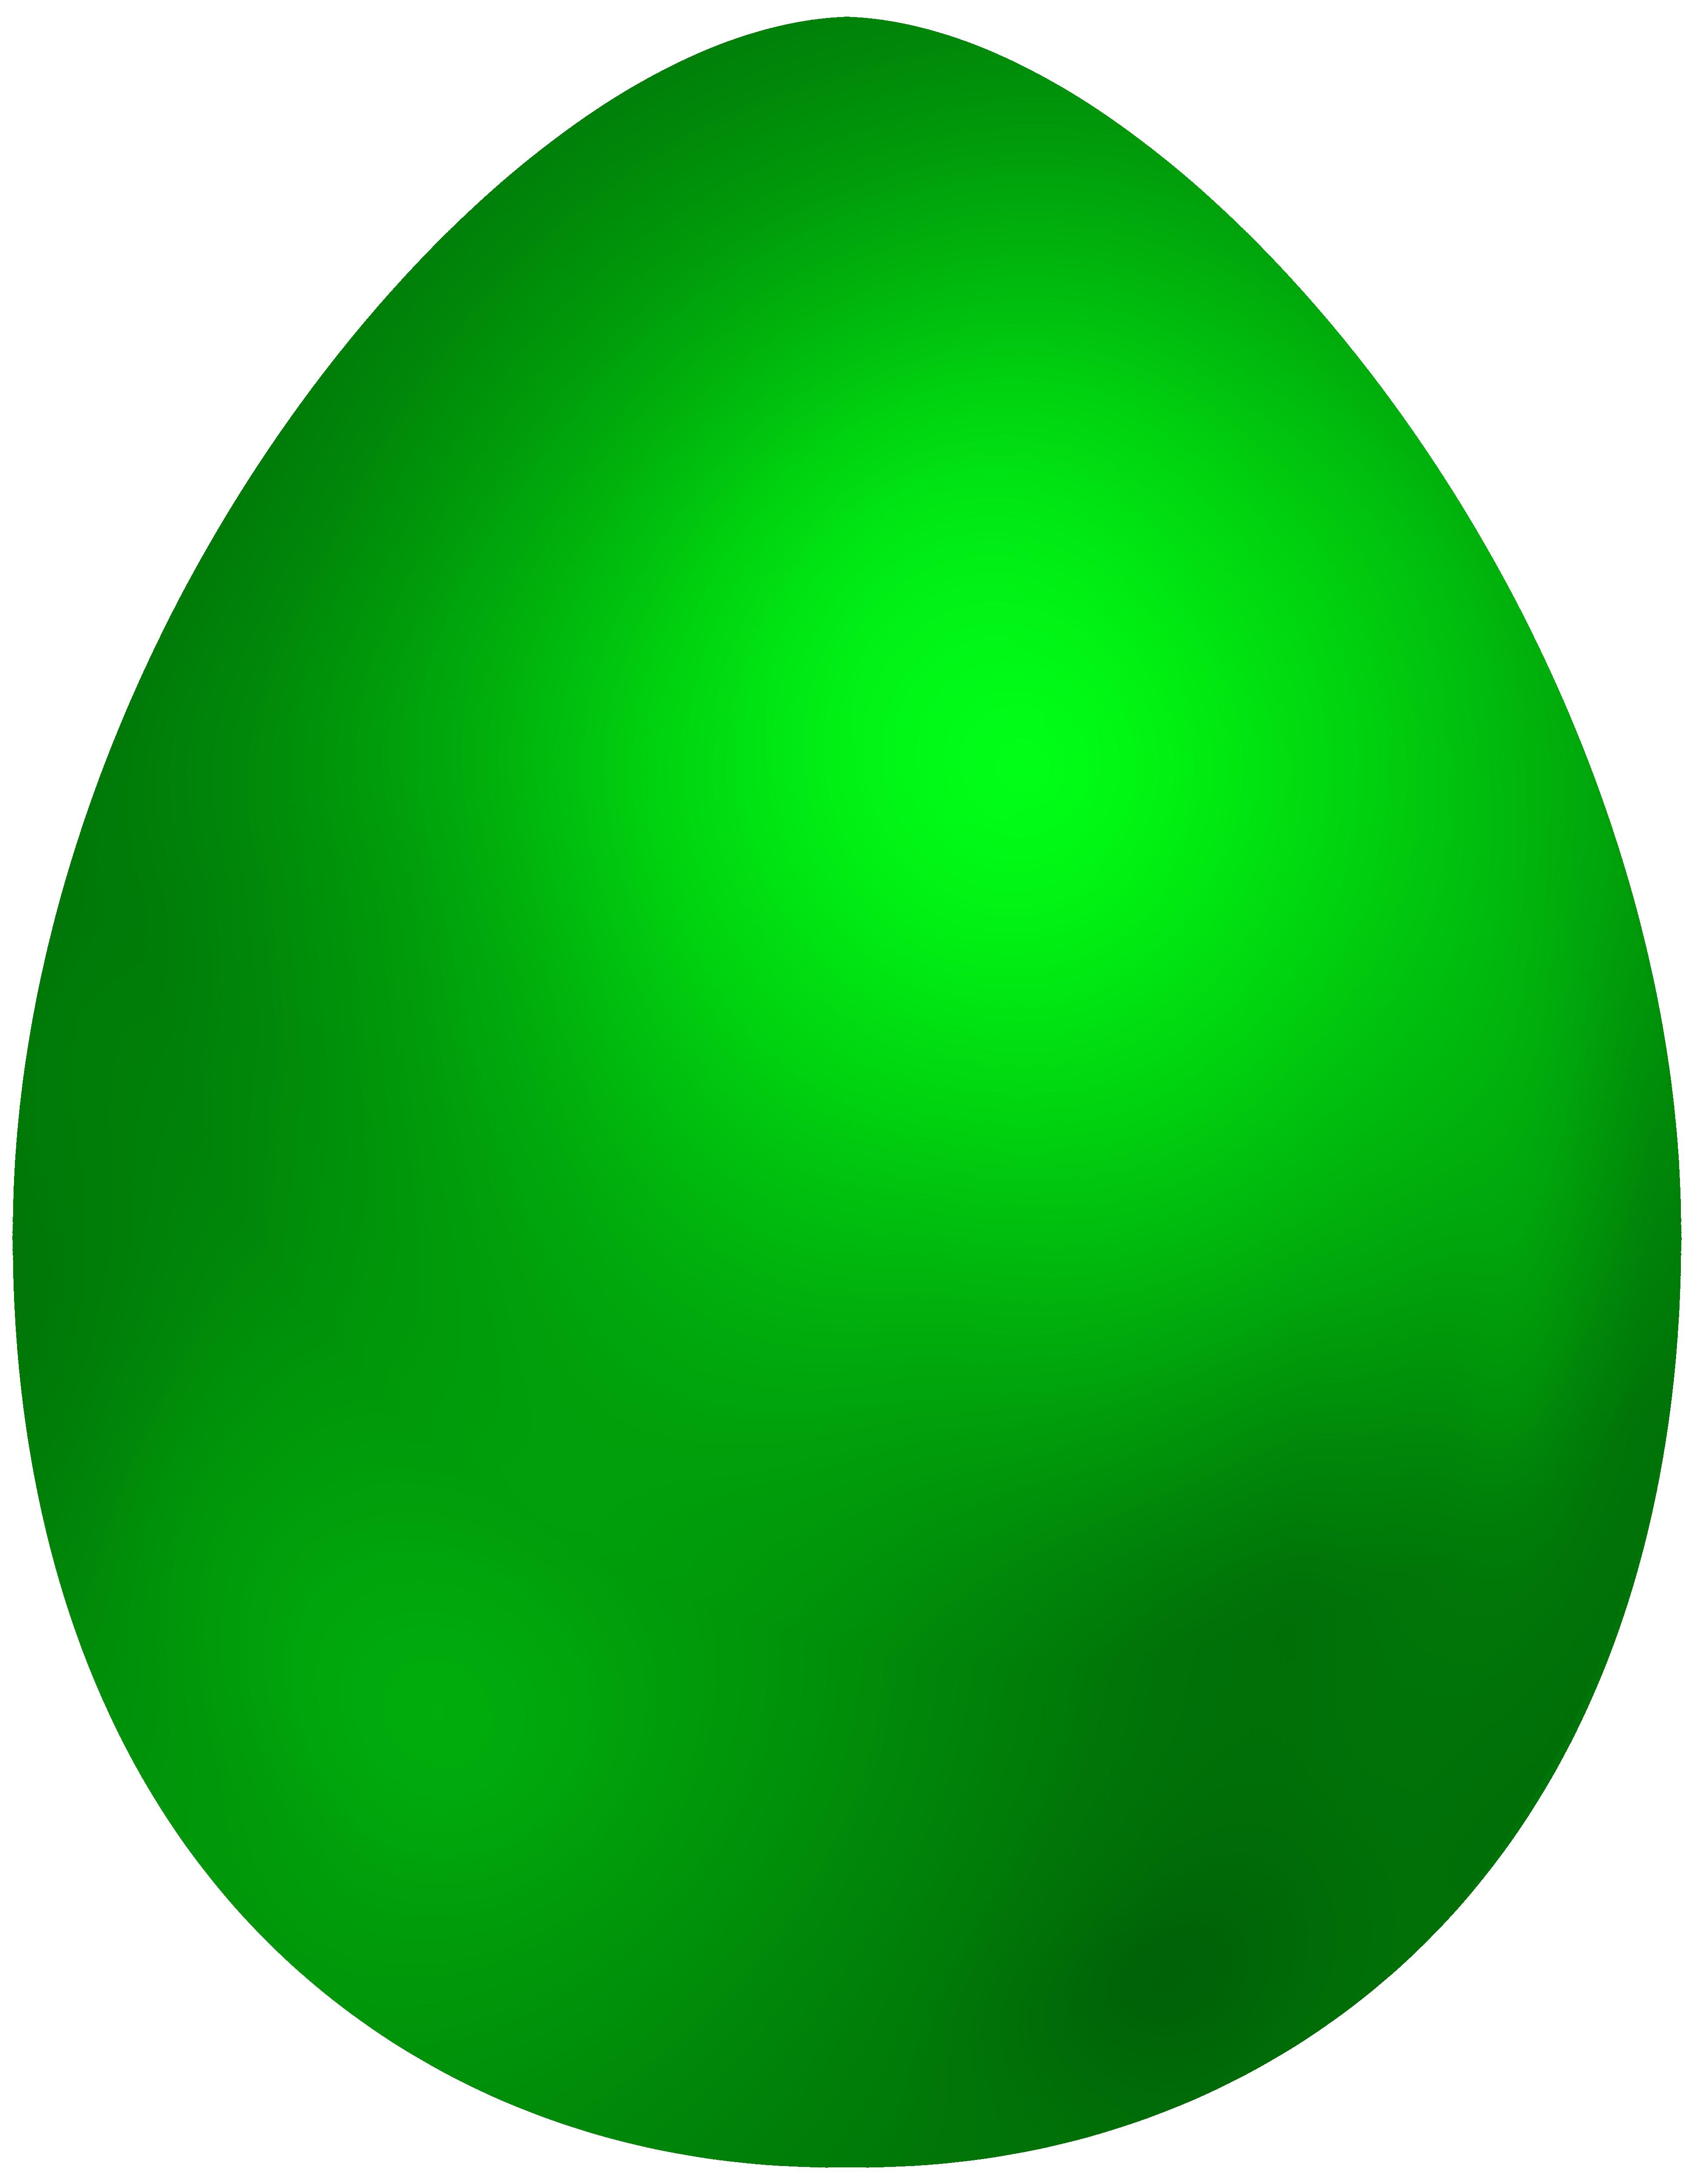 Green Easter Egg PNG Clip Art - Best WEB Clipart